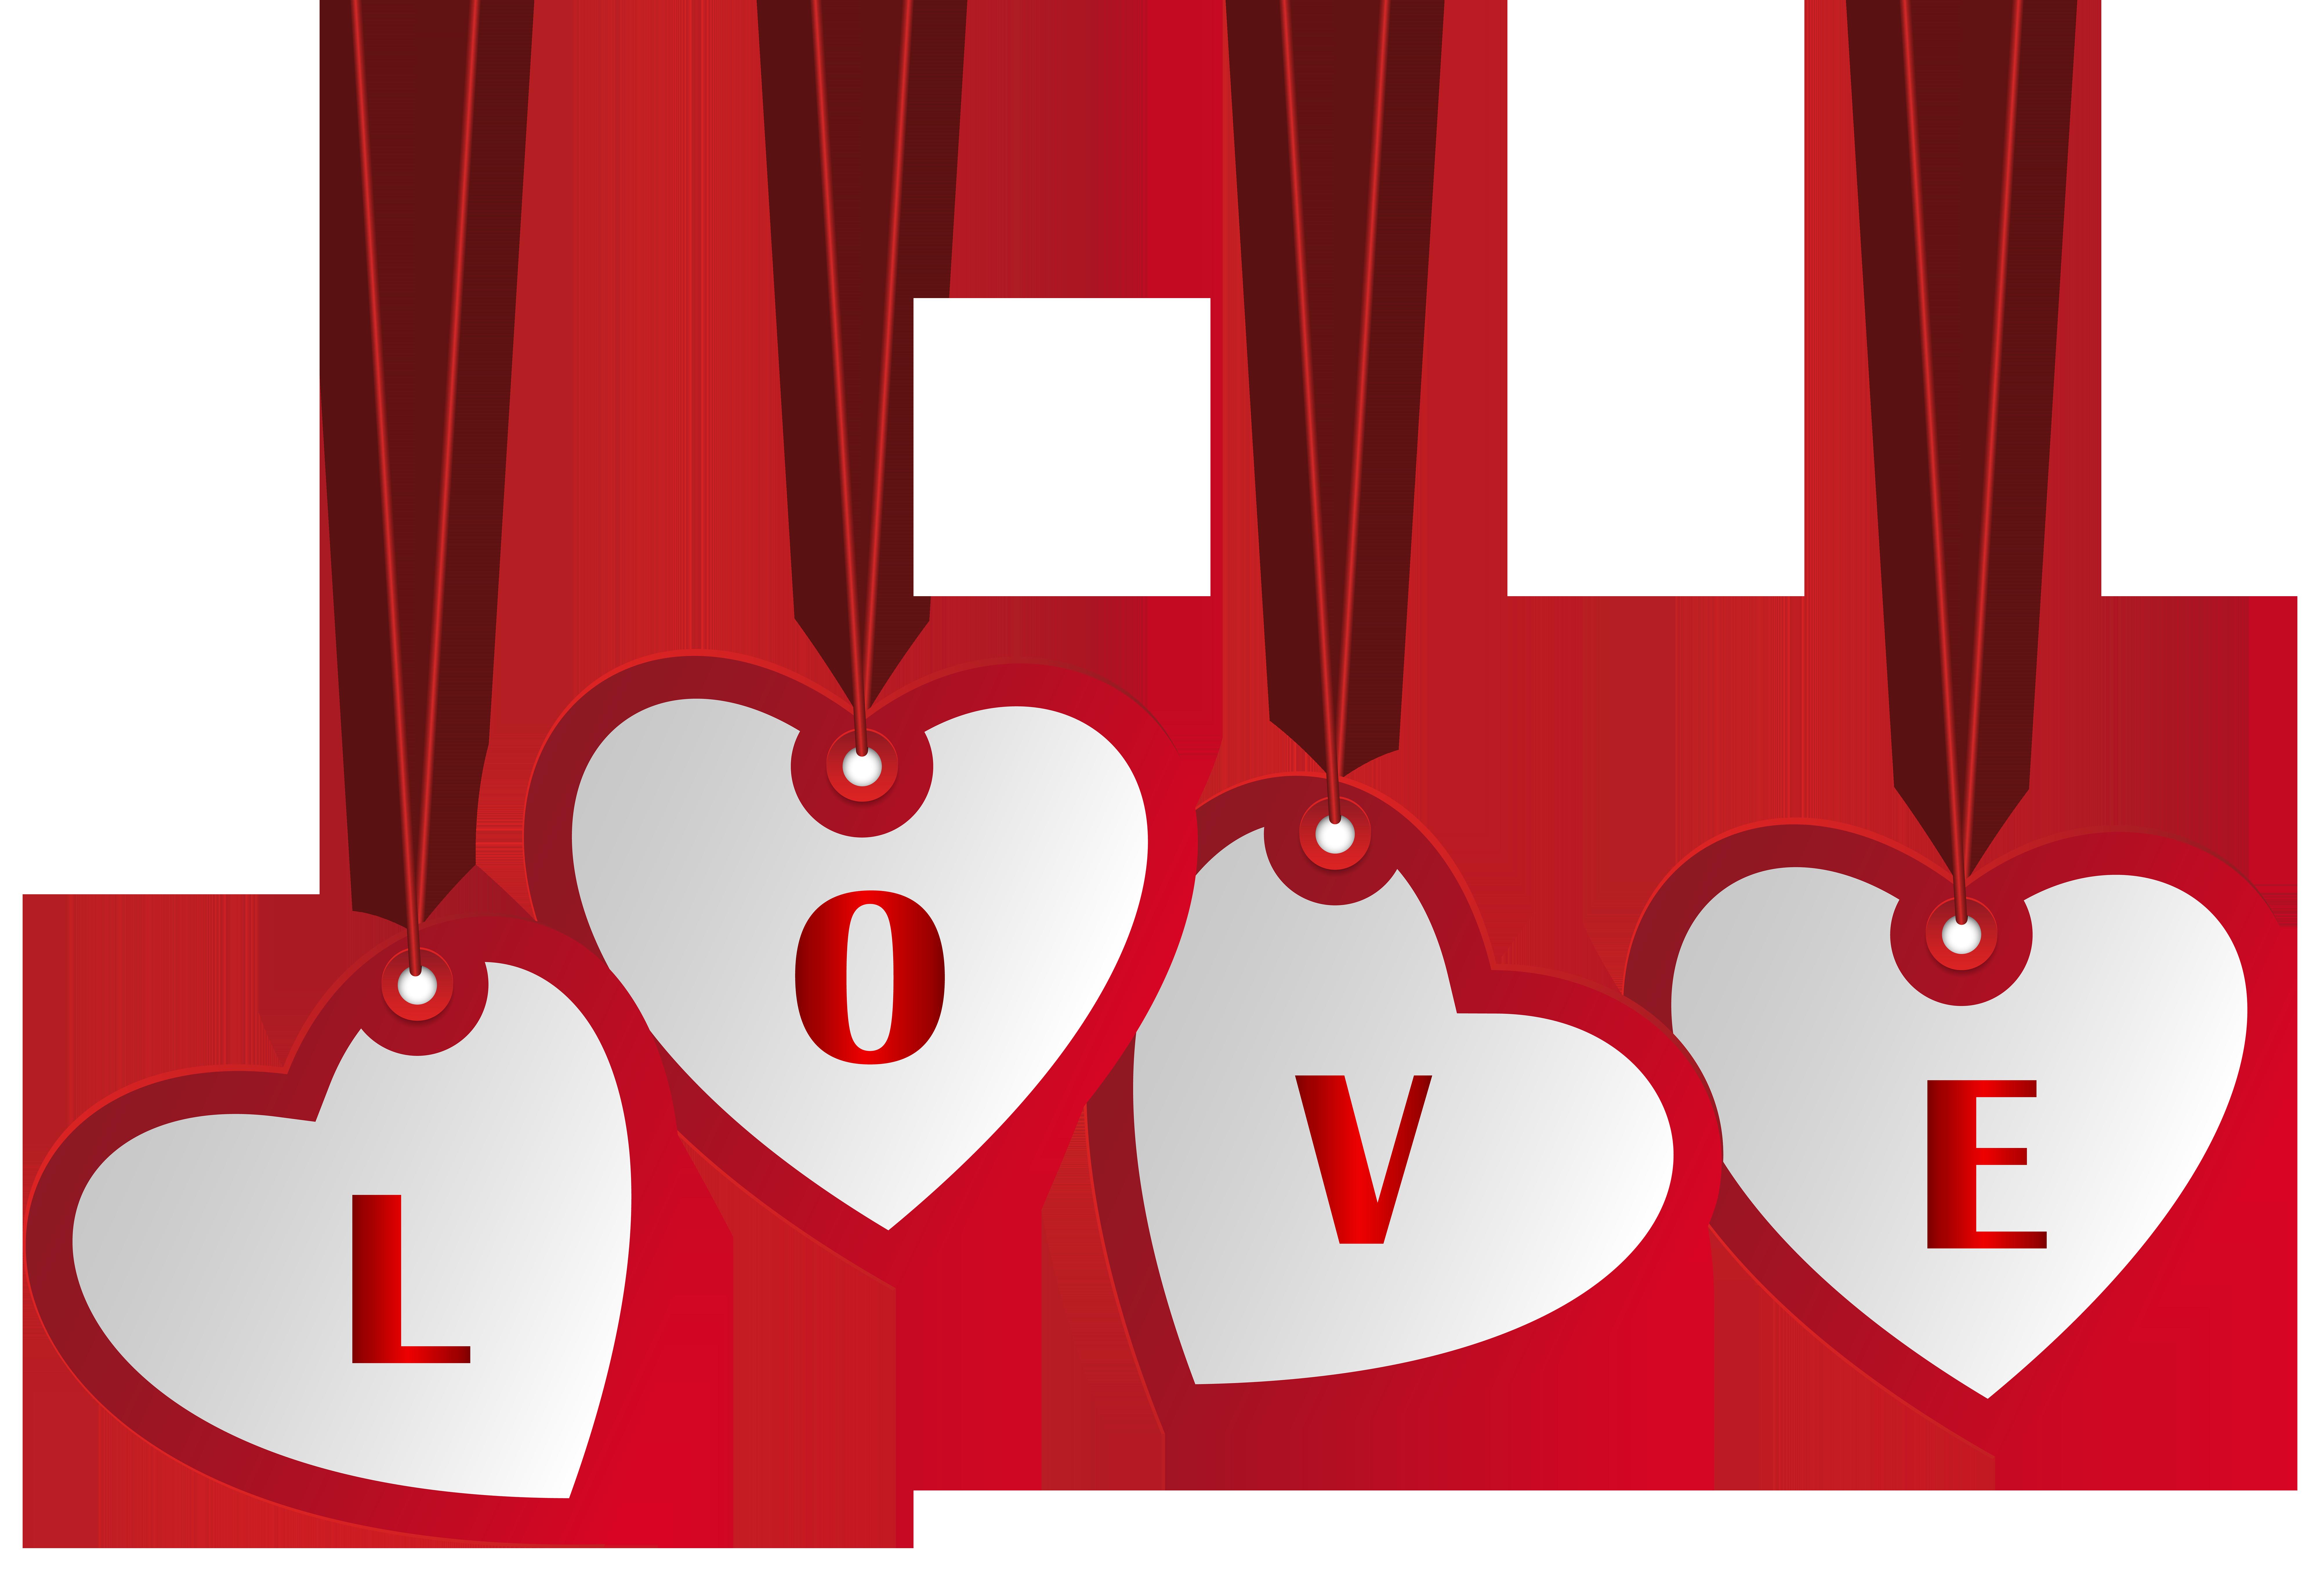 Love hearts png. Transparent images pluspng tshirt